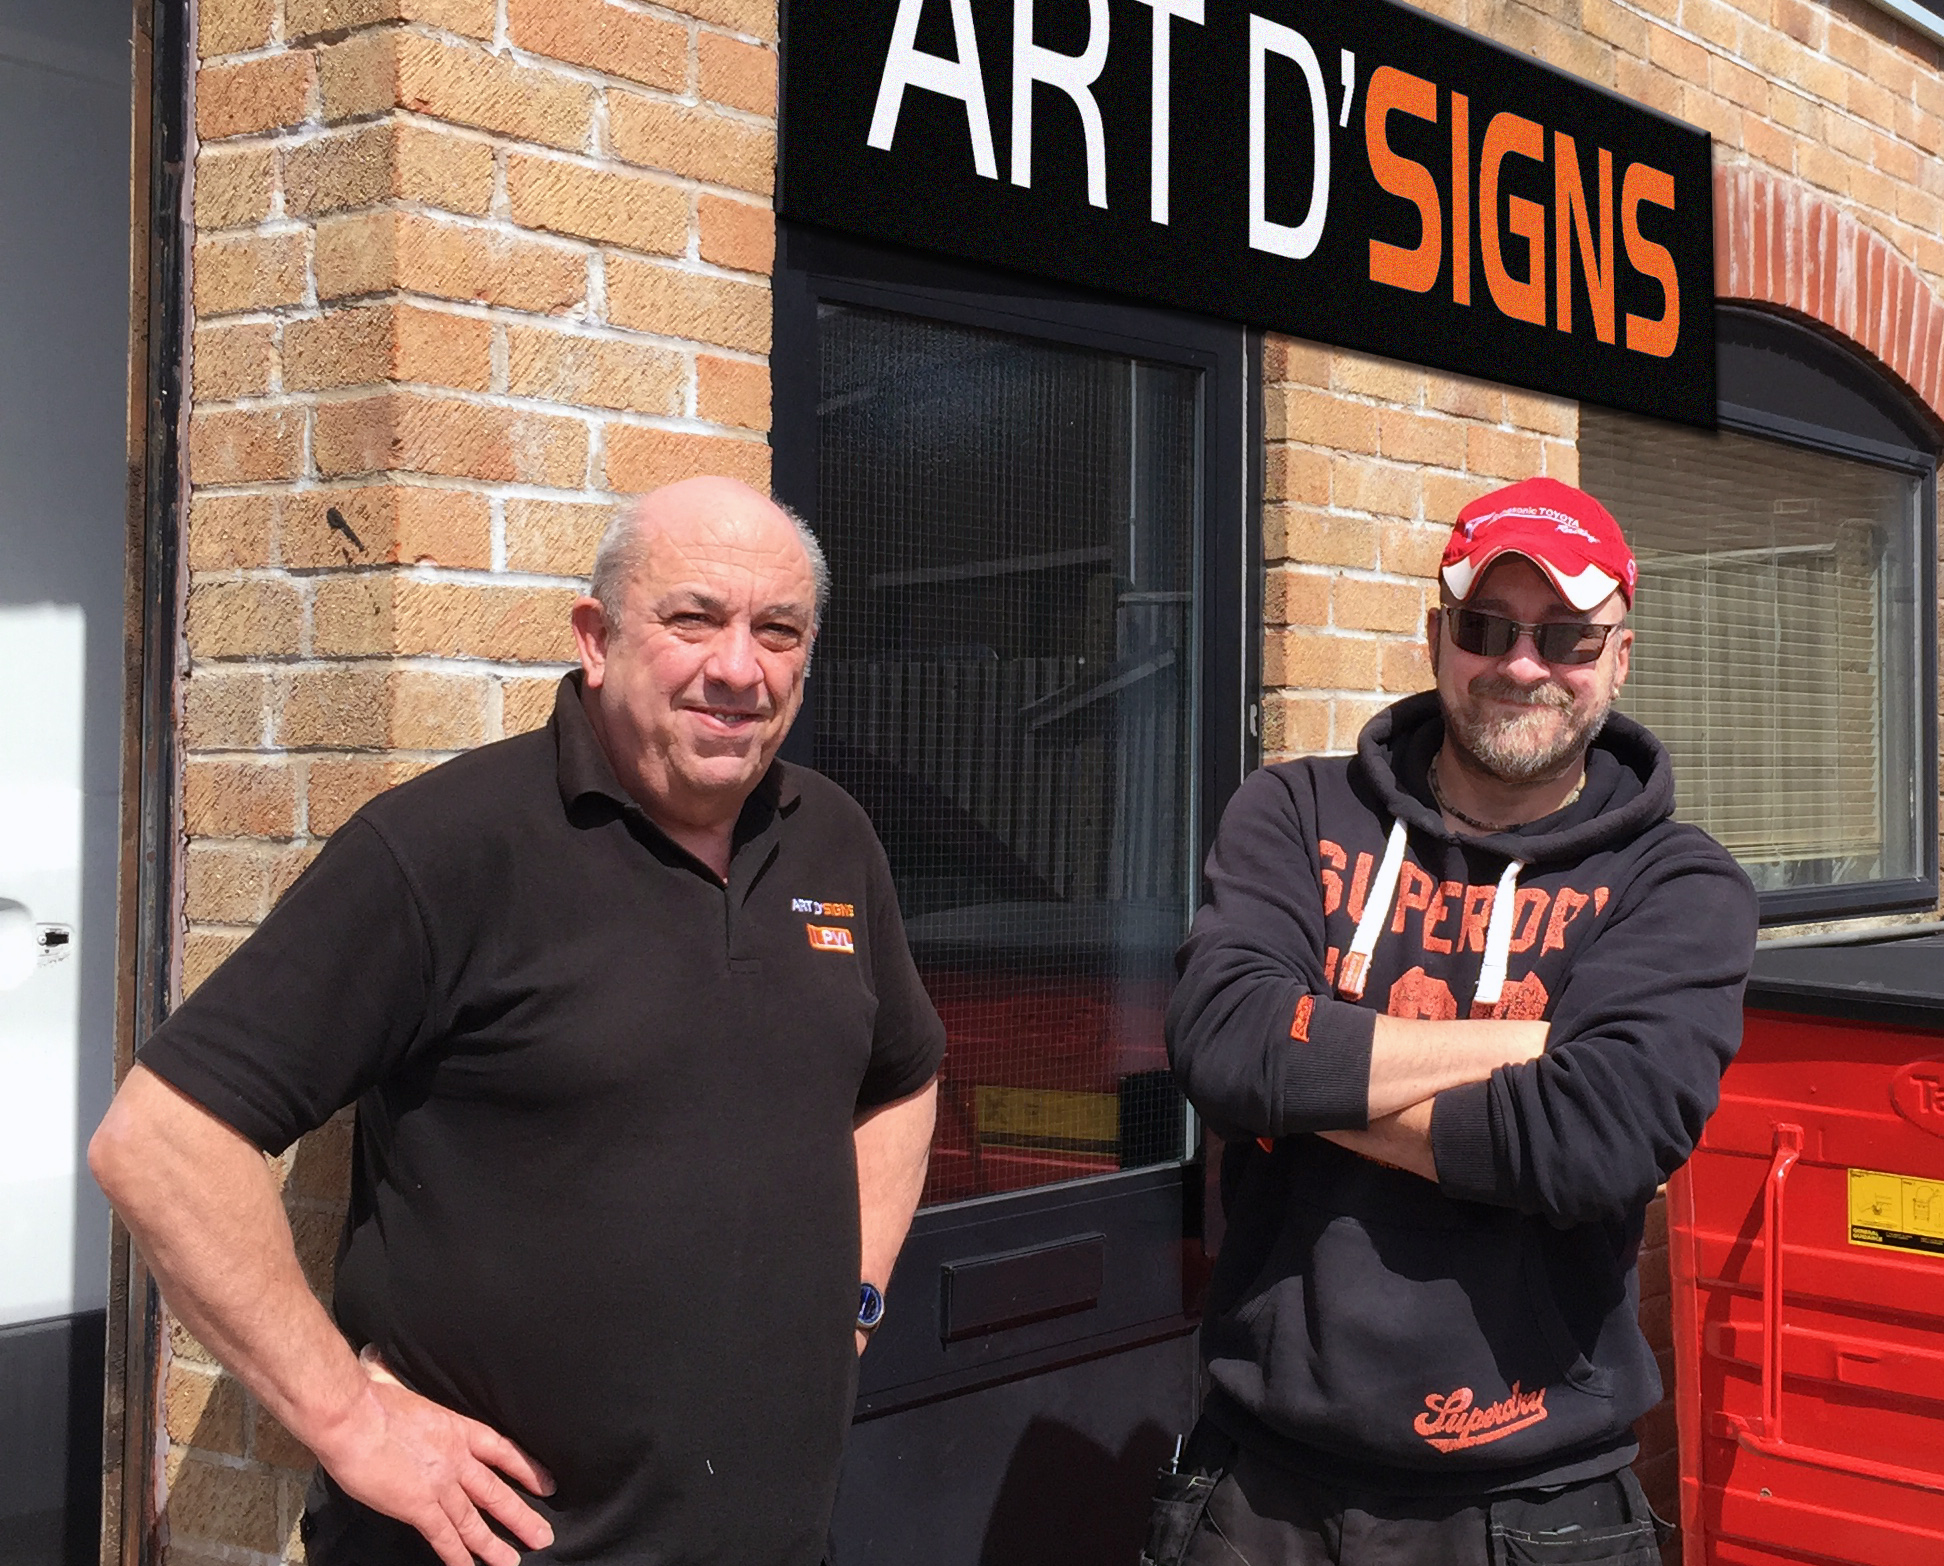 Art D'Signs 40th anniversary